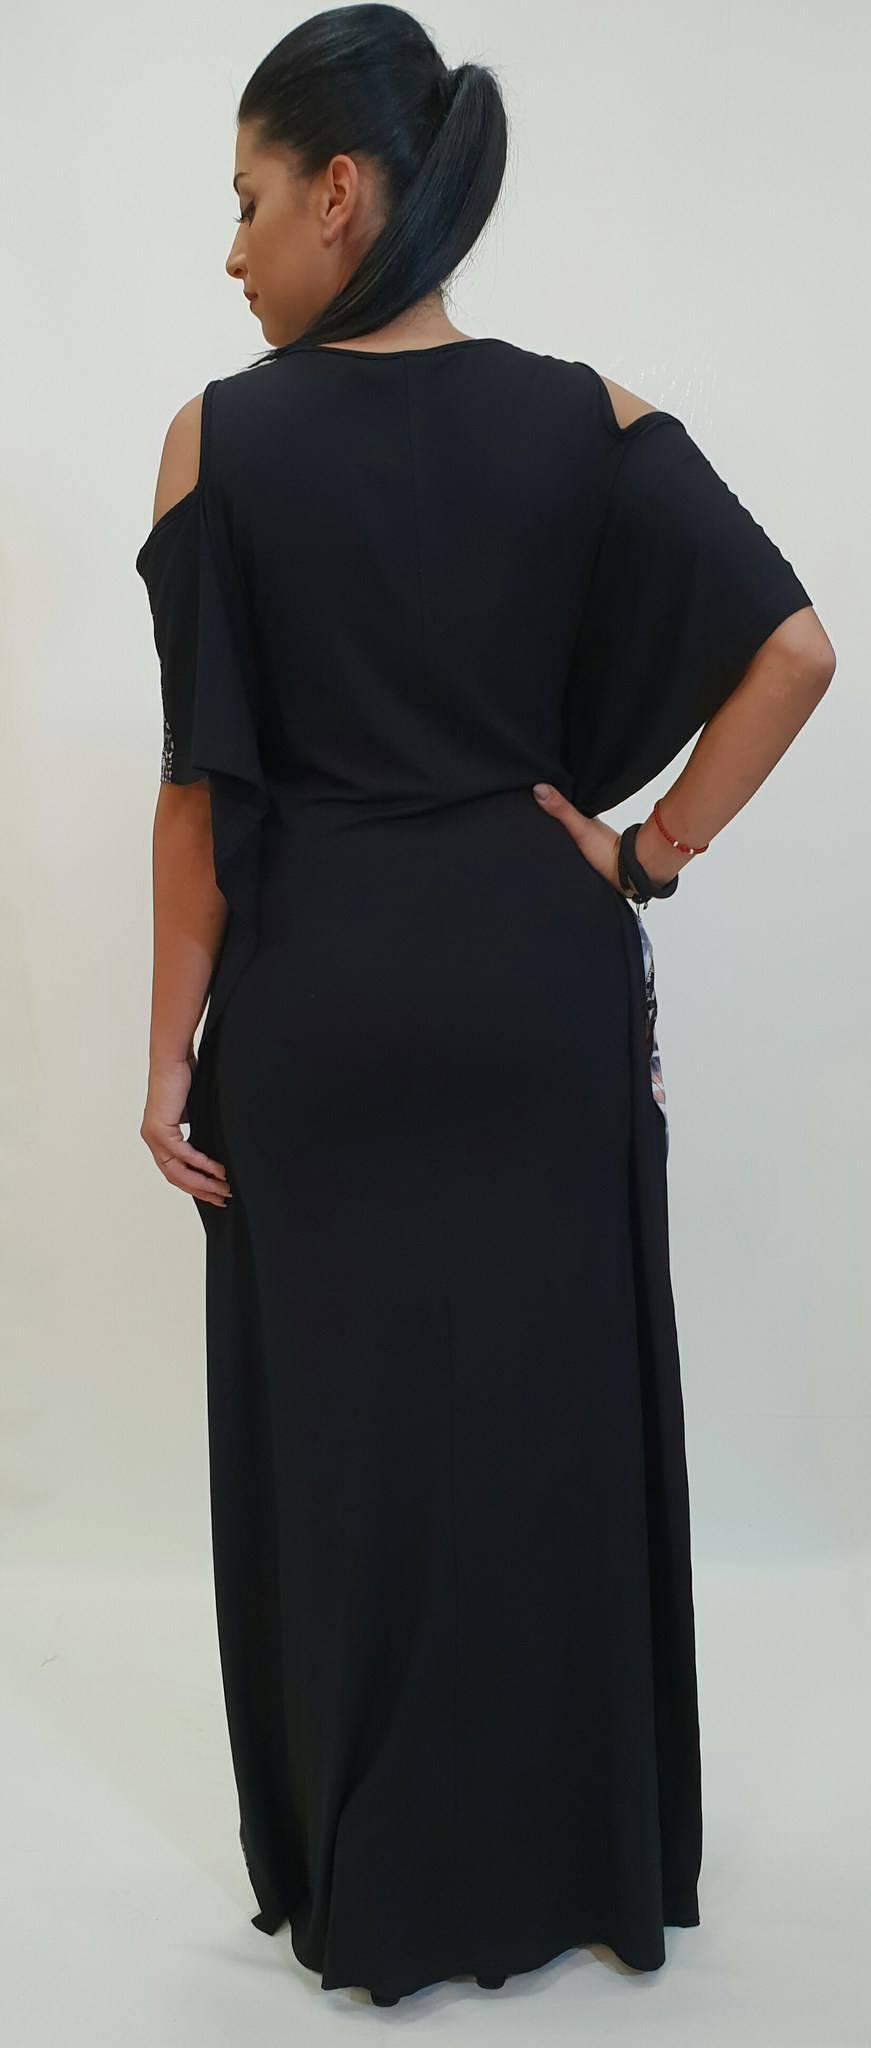 26561f333543 Φόρεμα καφτάνι με δαντέλα στο μπούστο - For ever Chania Clothing ...